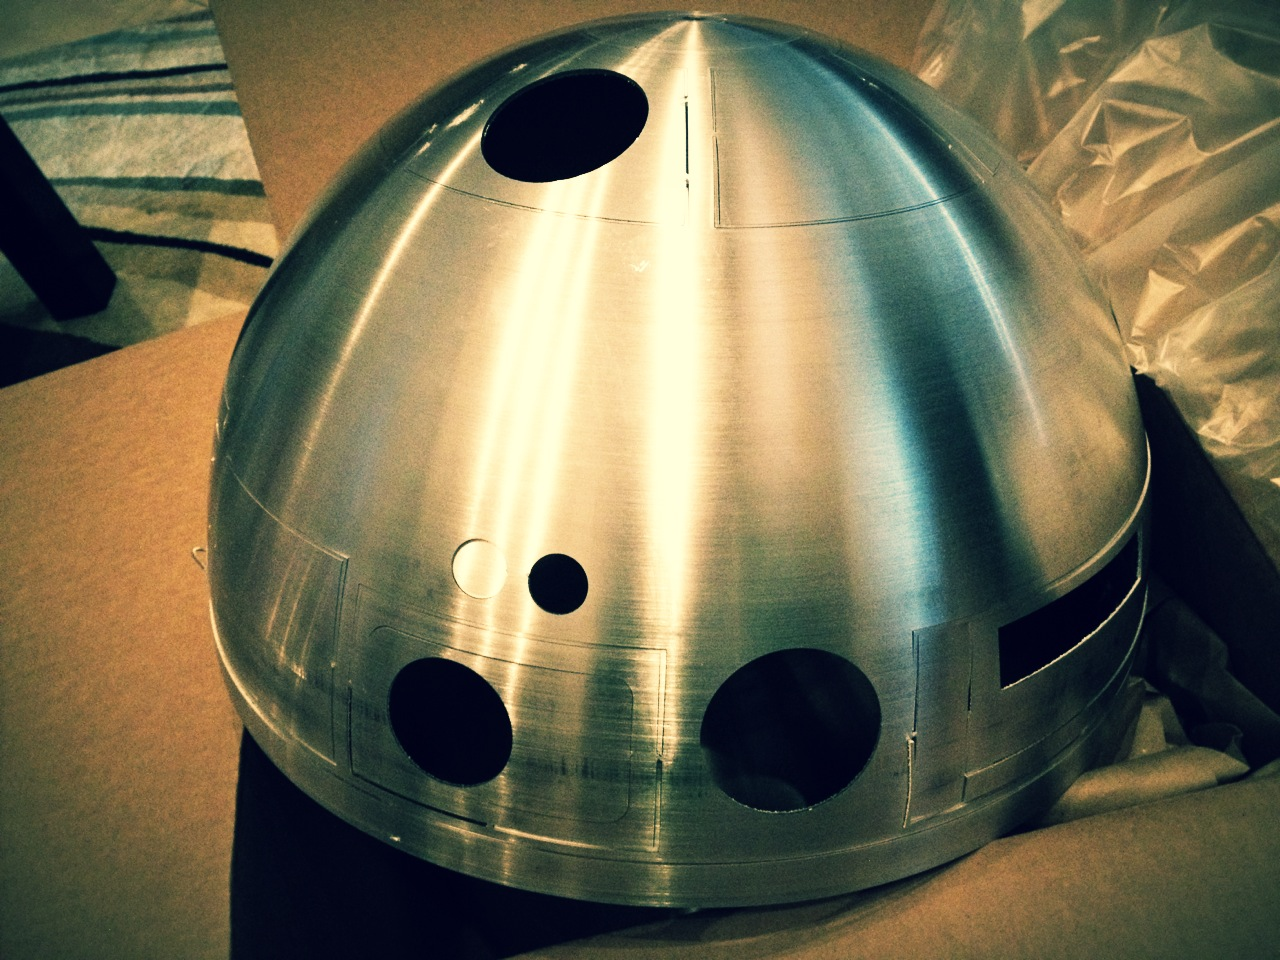 R2 Dome Arrival